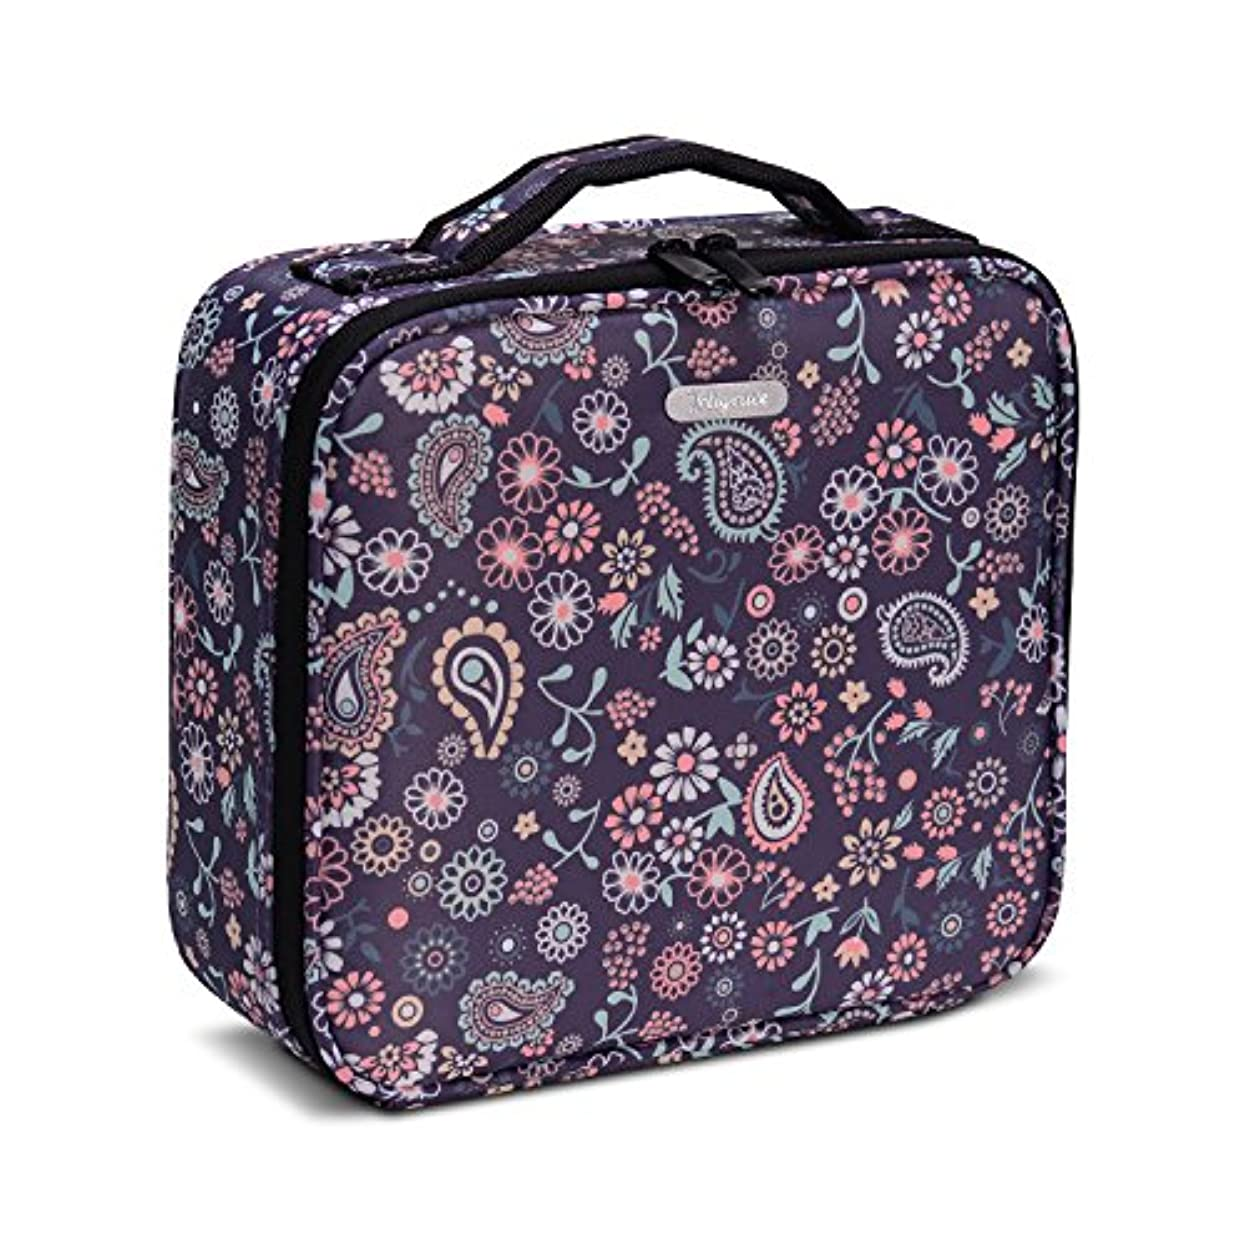 Hapilife メイクボックス プロ用 コスメボックス 大容量 軽量 メイク道具 化粧品収納 小物入れ 持ち運び 3way 収納ケース 調整仕切り板(紫の花)